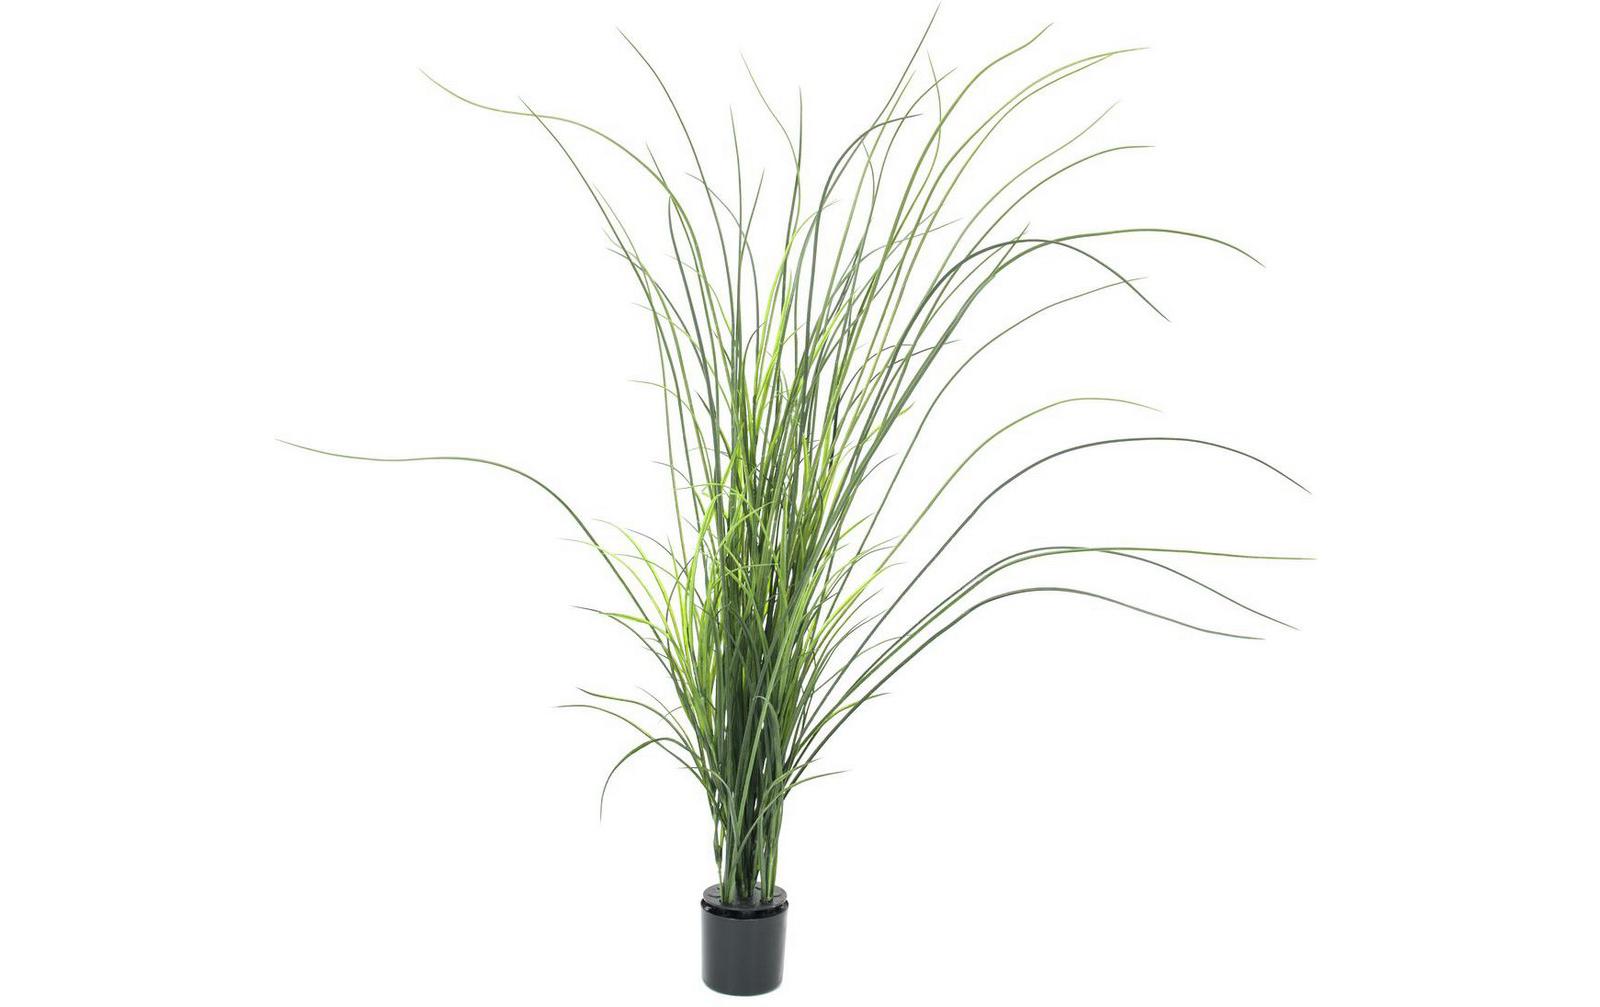 europalms-schilfgras-145cm-kunststoffpflanze